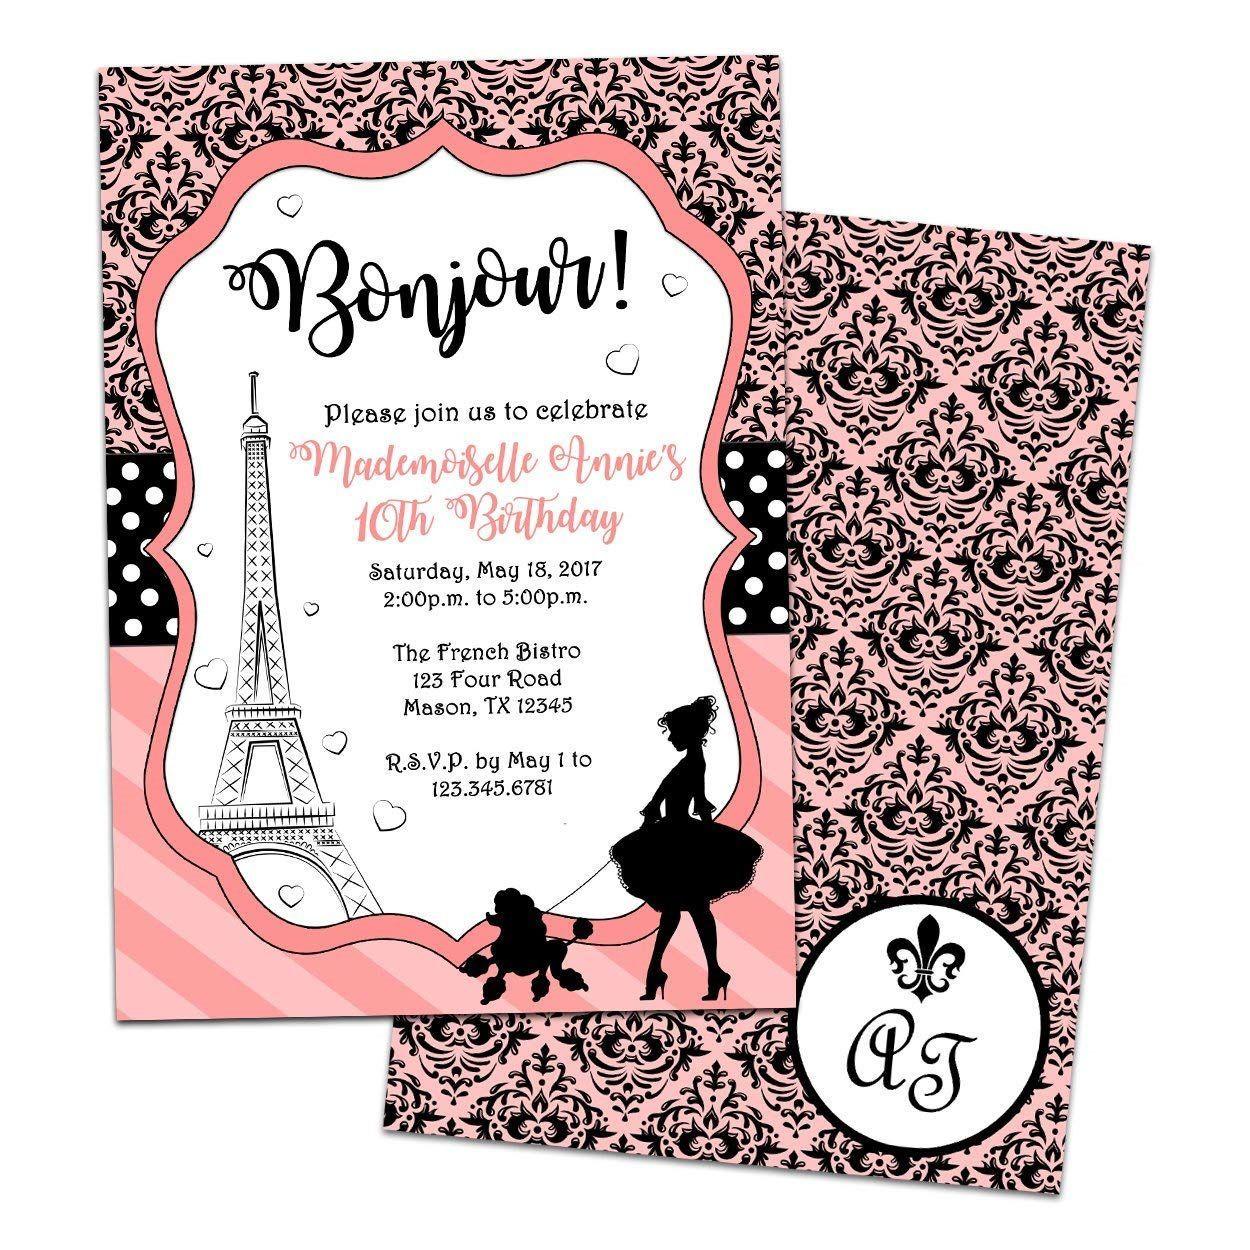 002 Beautiful Pari Birthday Invitation Template Free Concept Full